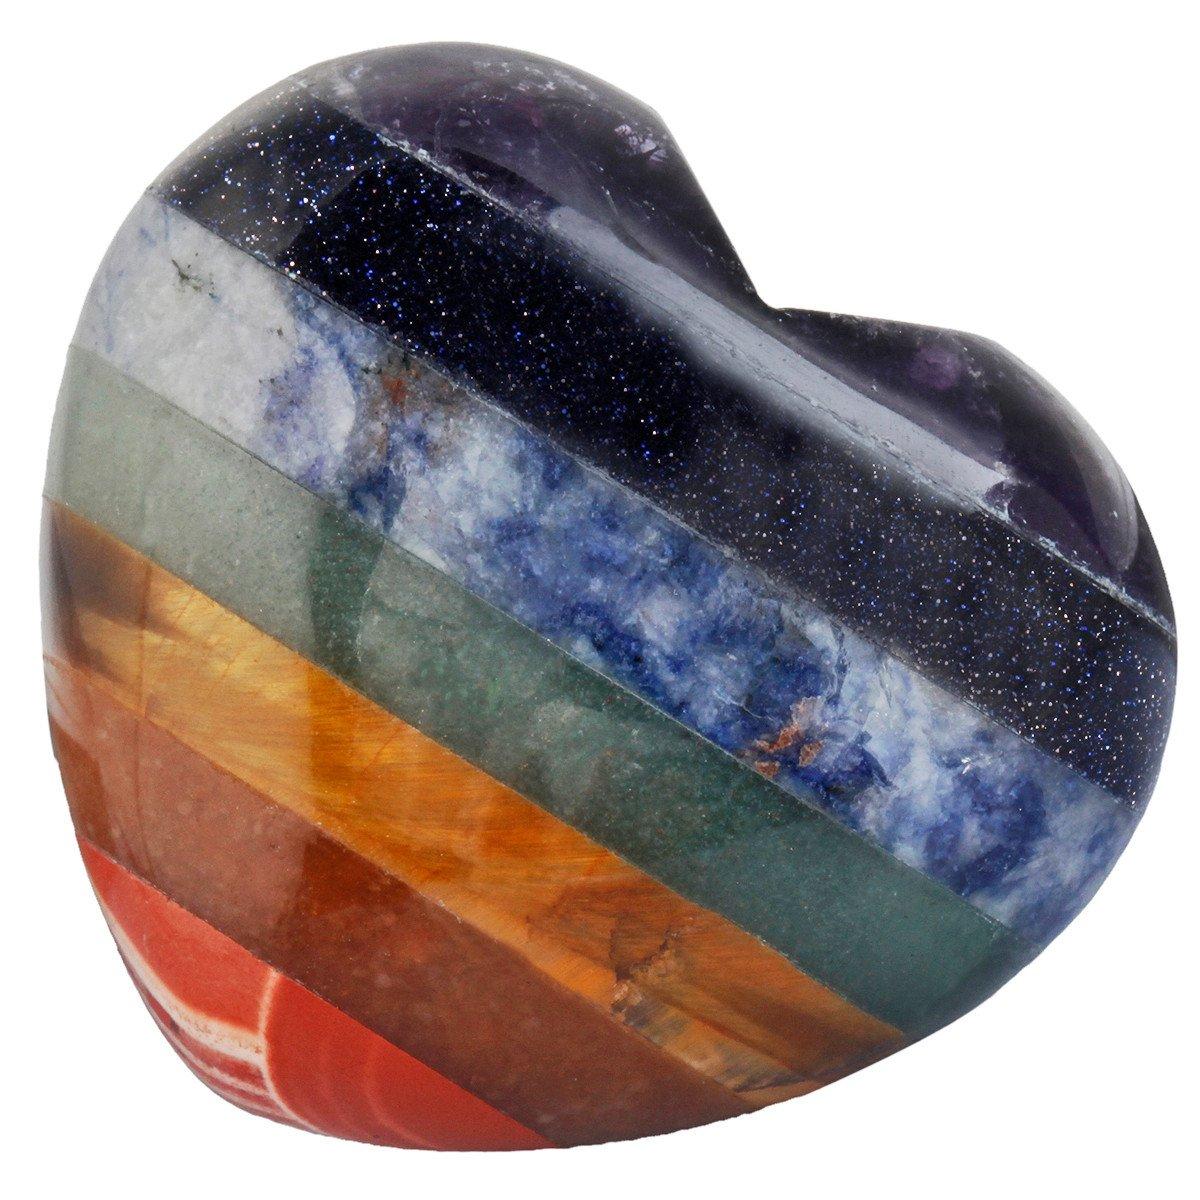 mookaitedecor Healing Crystals Heart Love Worry Palm Stone Reiki Balancing 1.6 inches,7 Chakta Stone